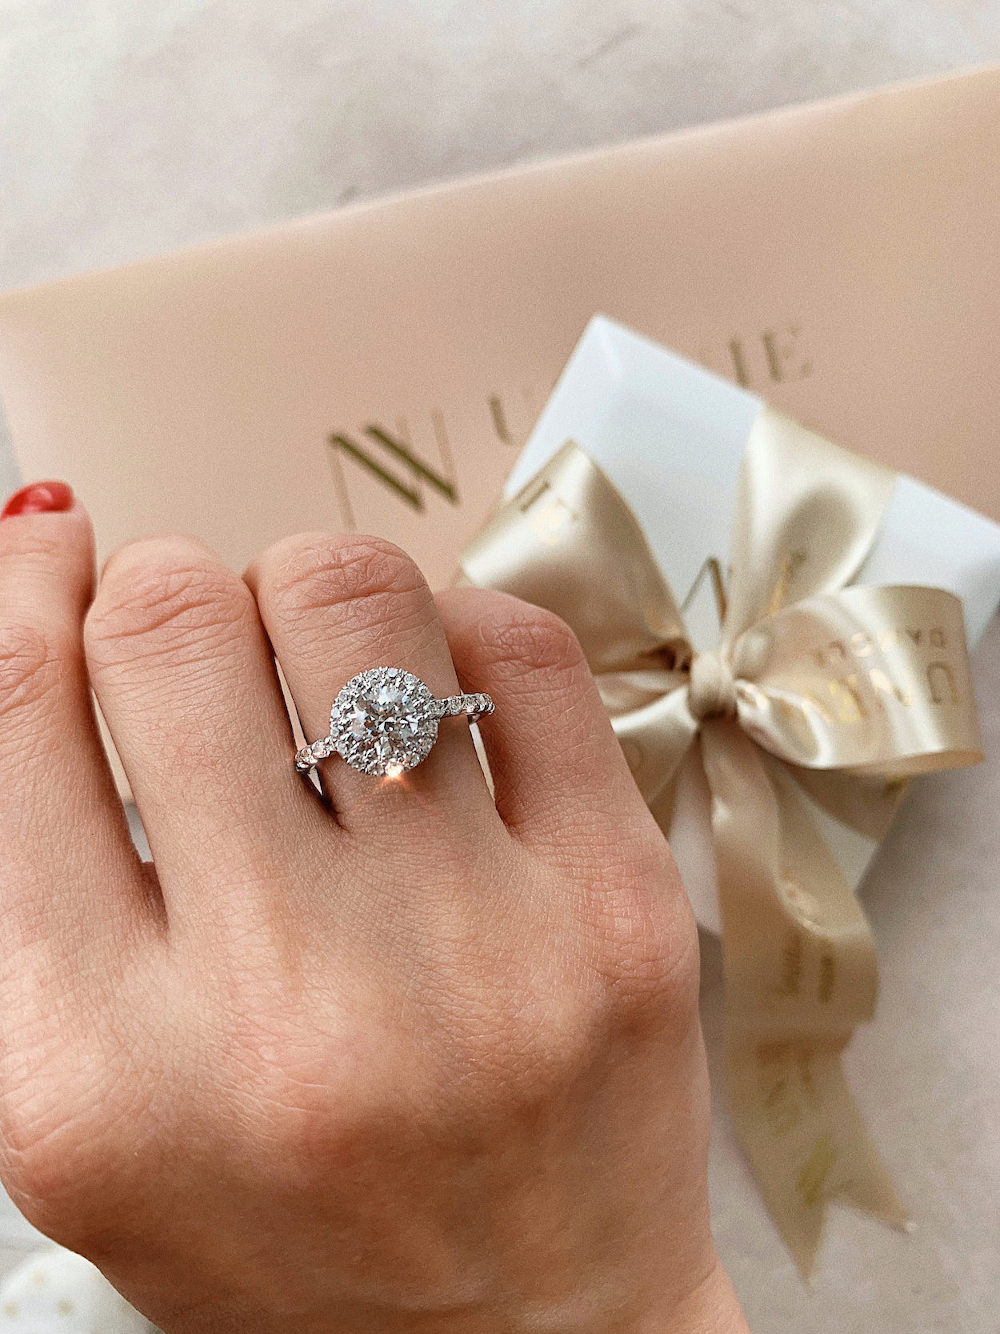 N4 Помолвочное кольцо из белого золота с бриллиантами